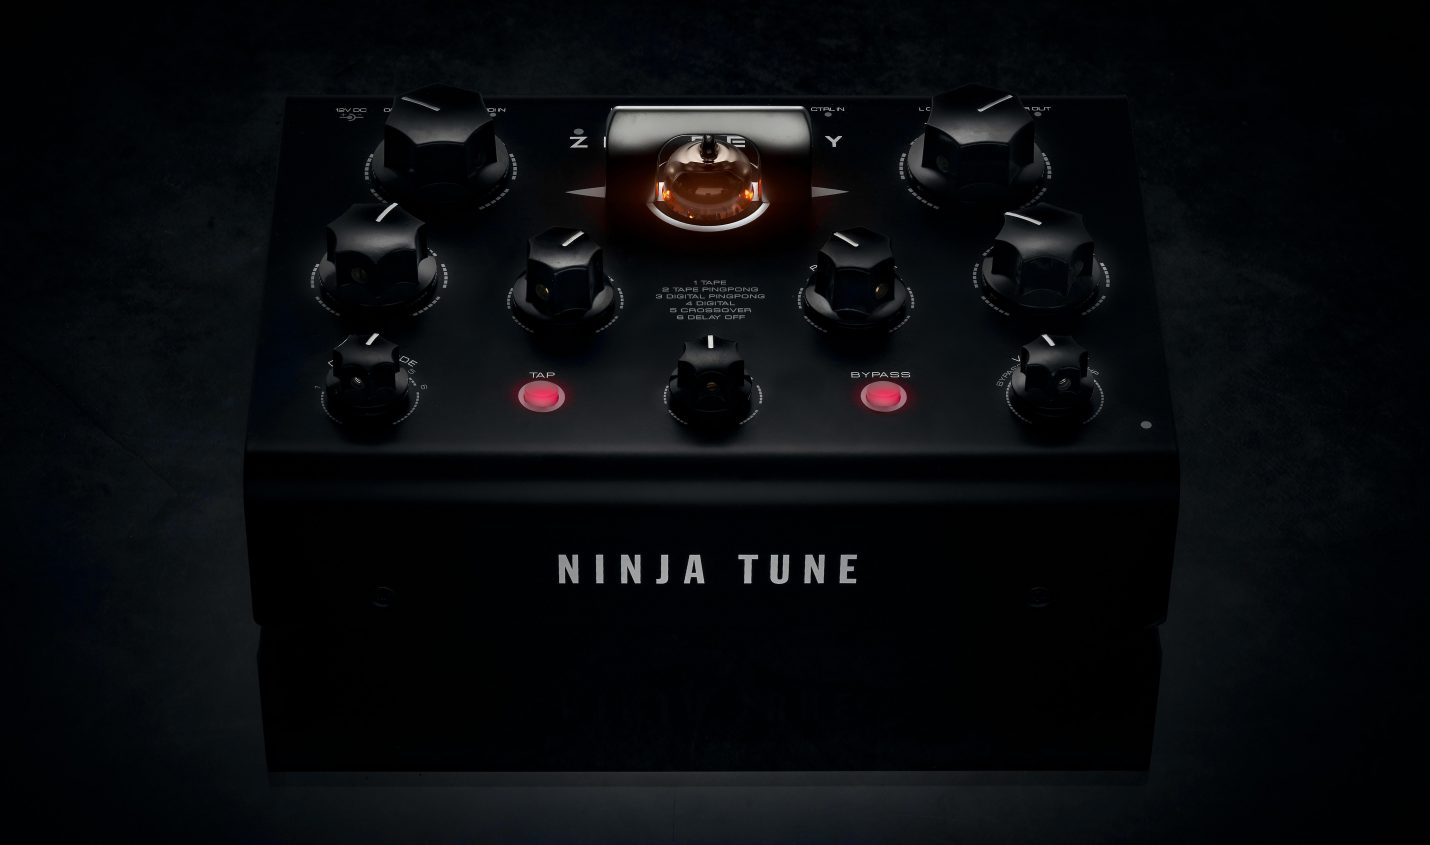 Neu: Ninja Tune + Erica Synths = Dub Delay